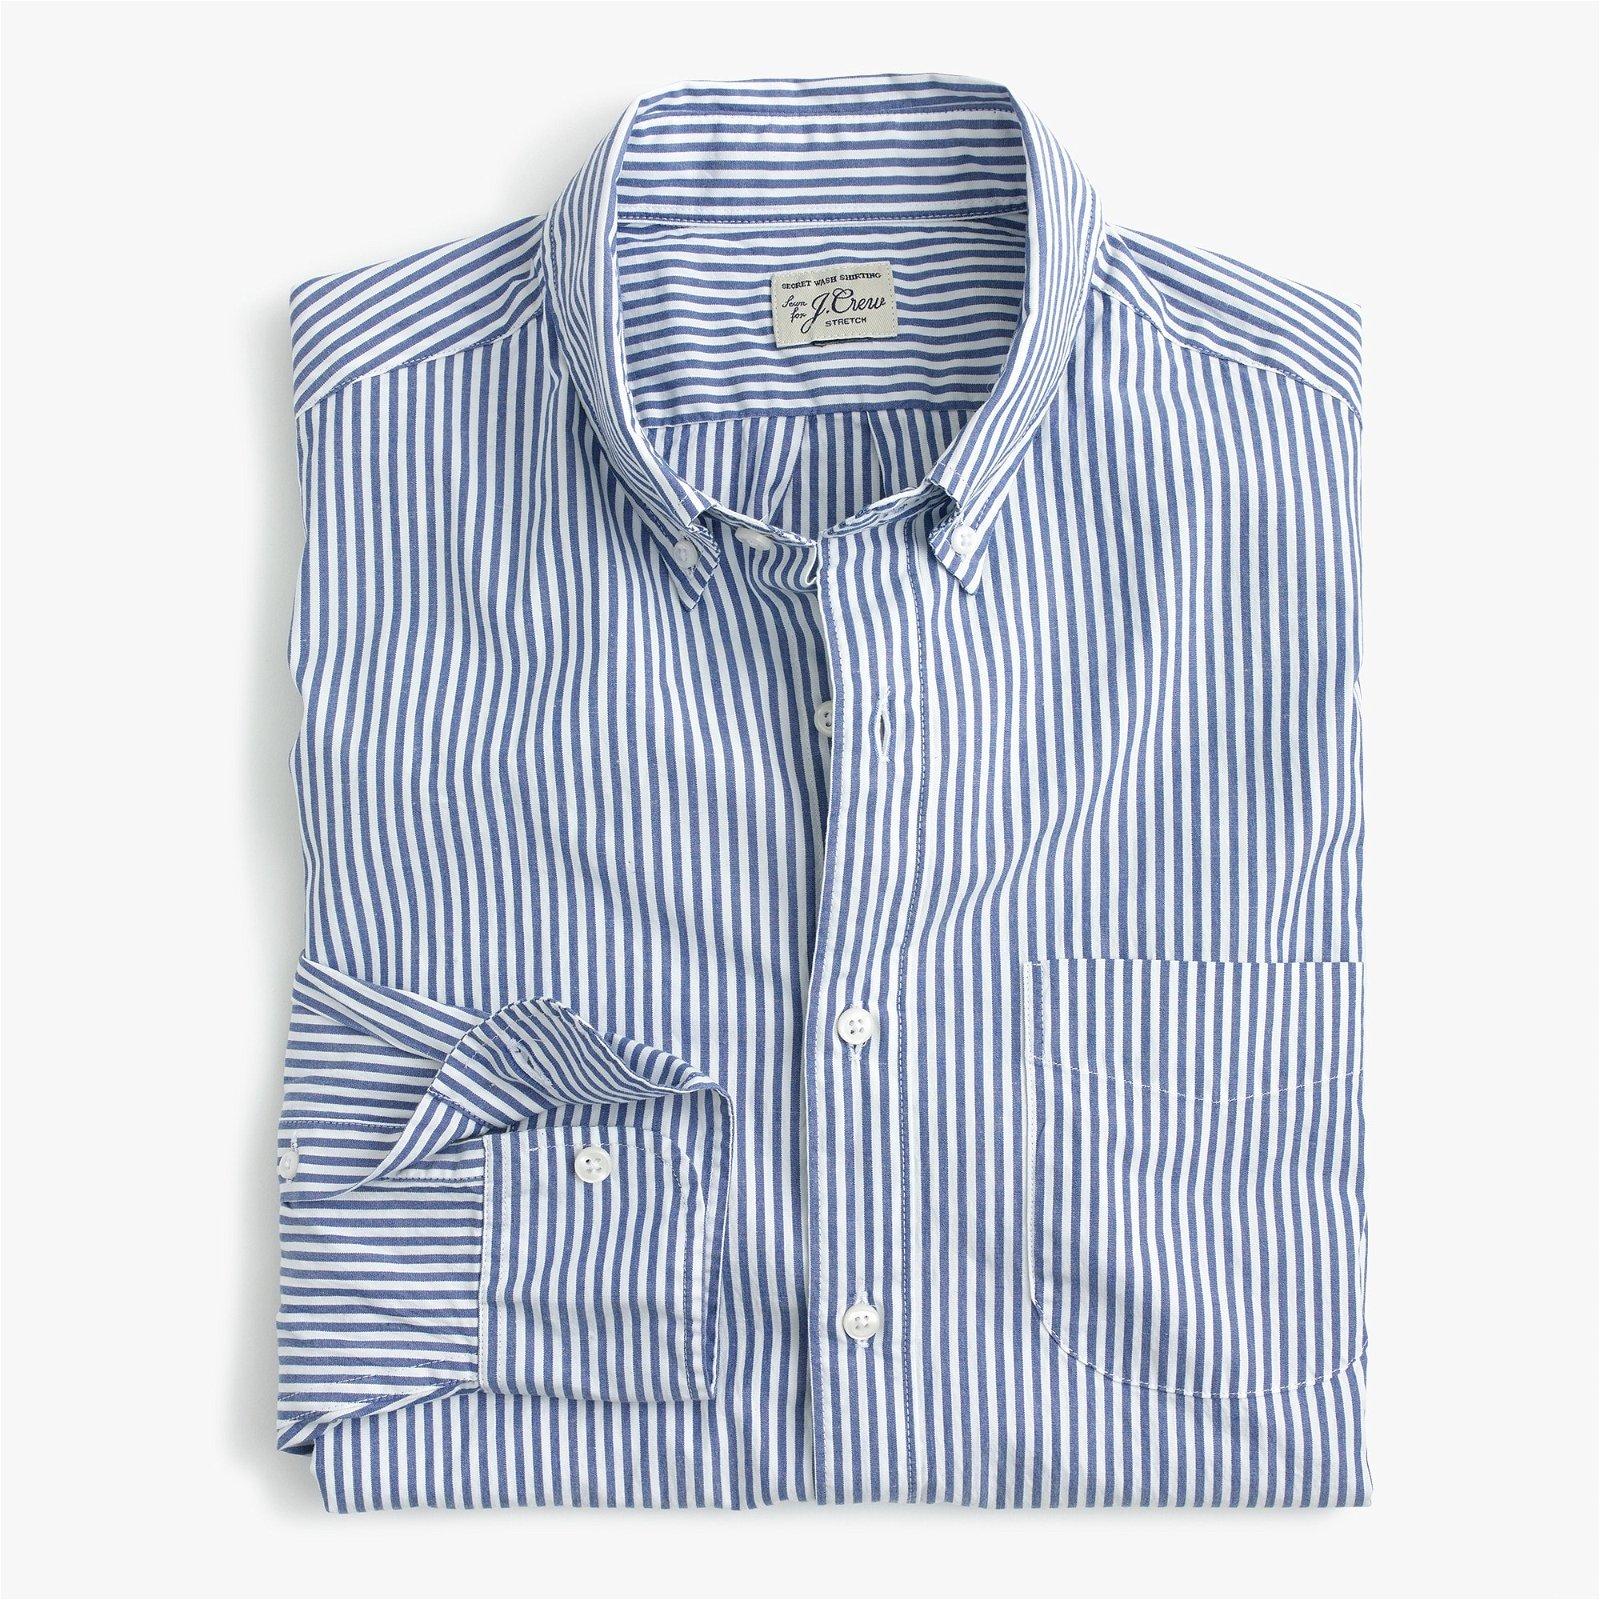 Classic Stretch Secret Wash shirt in poplin